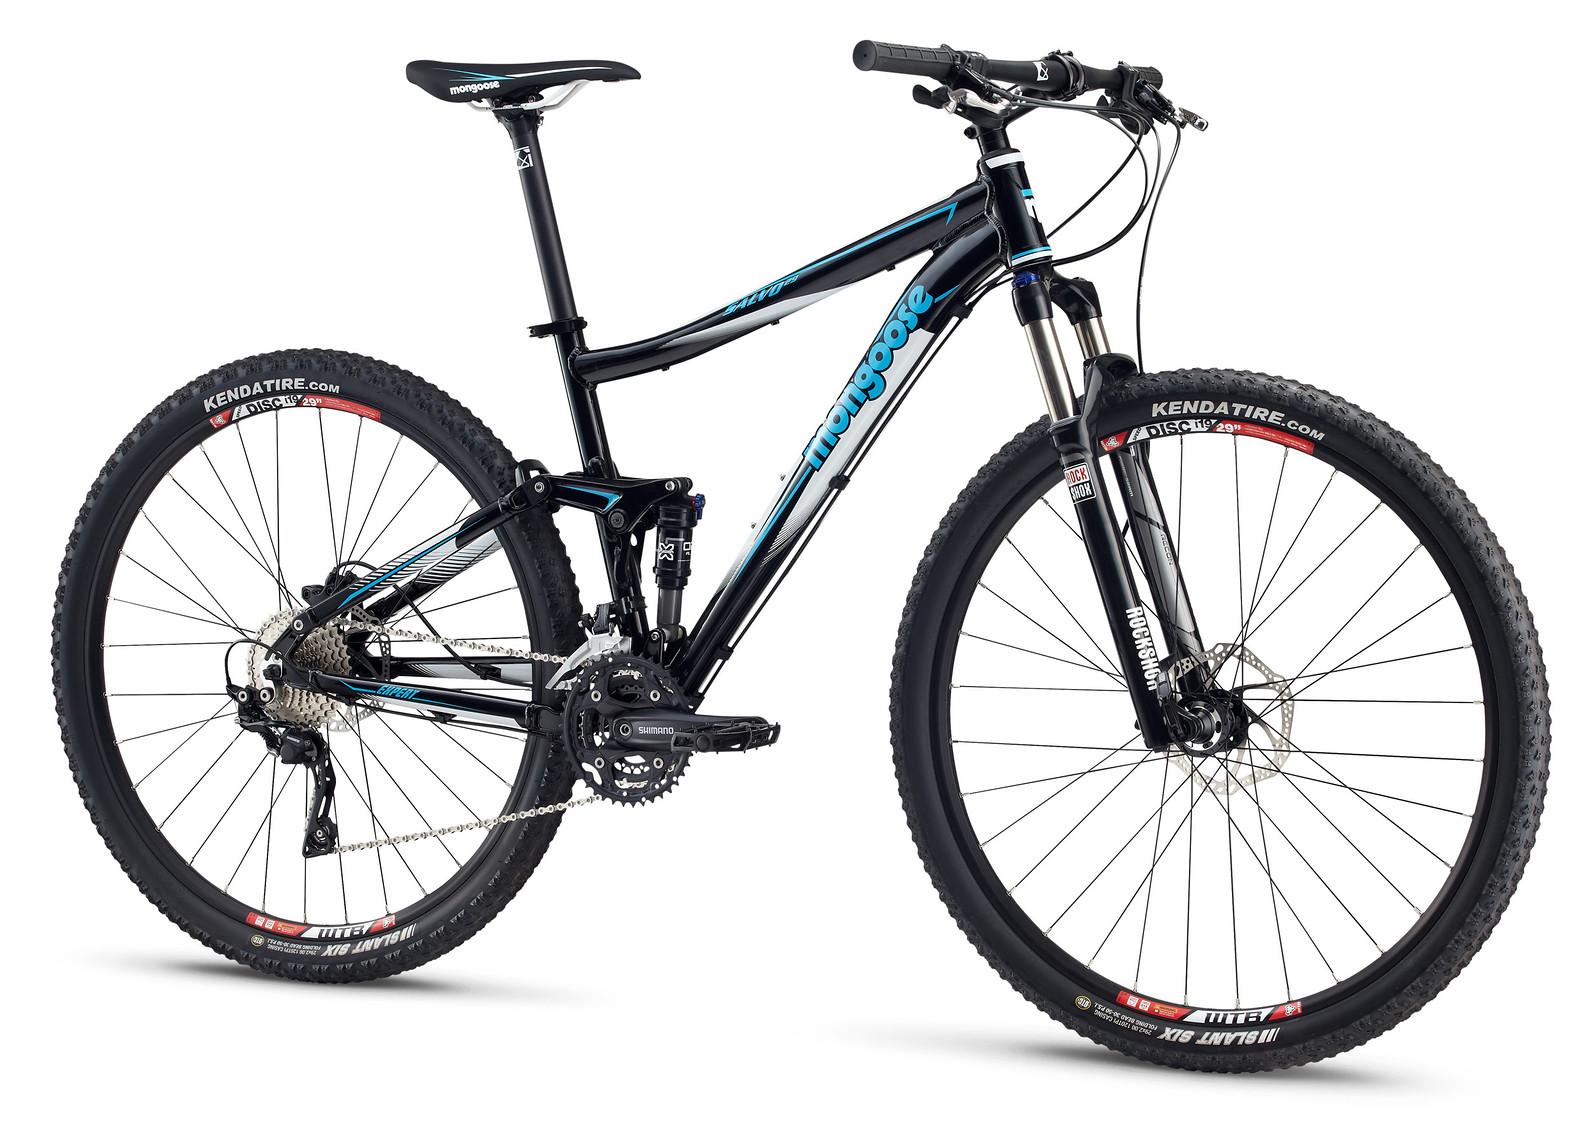 2014 Mongoose Salvo Expert 29 Bike